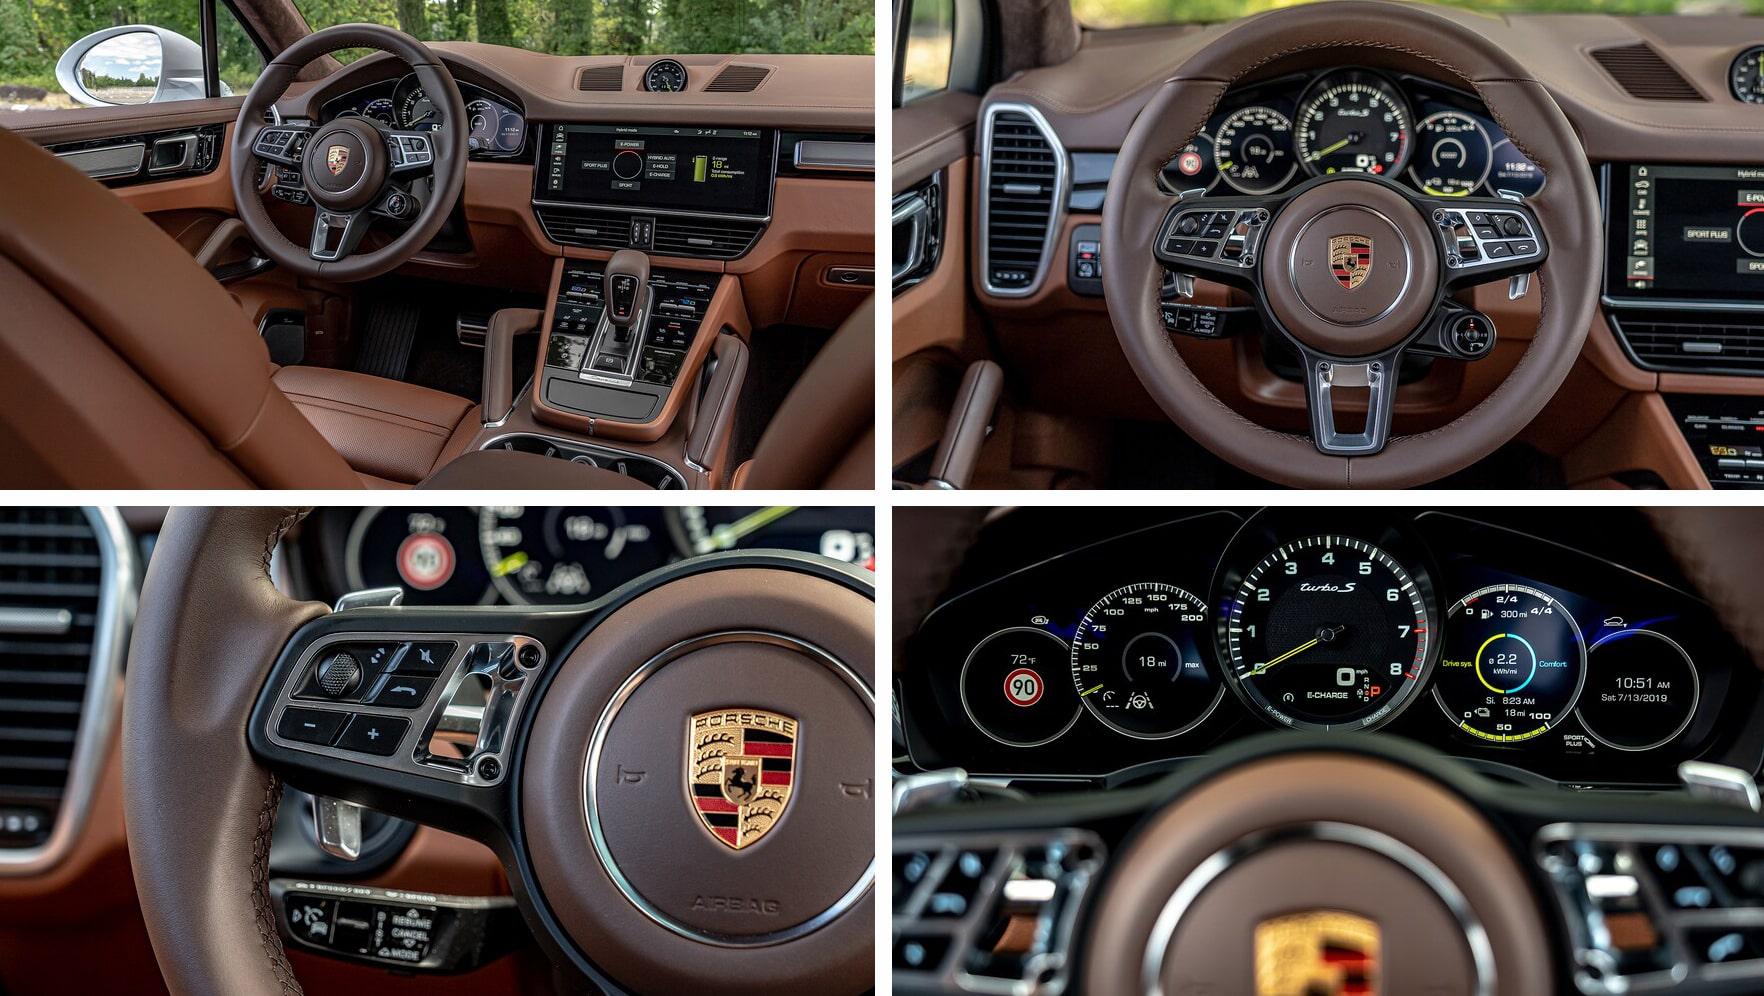 2020-Porsche-Cayenne-Turbo-S-E-Hybrid-PHEV-32-min